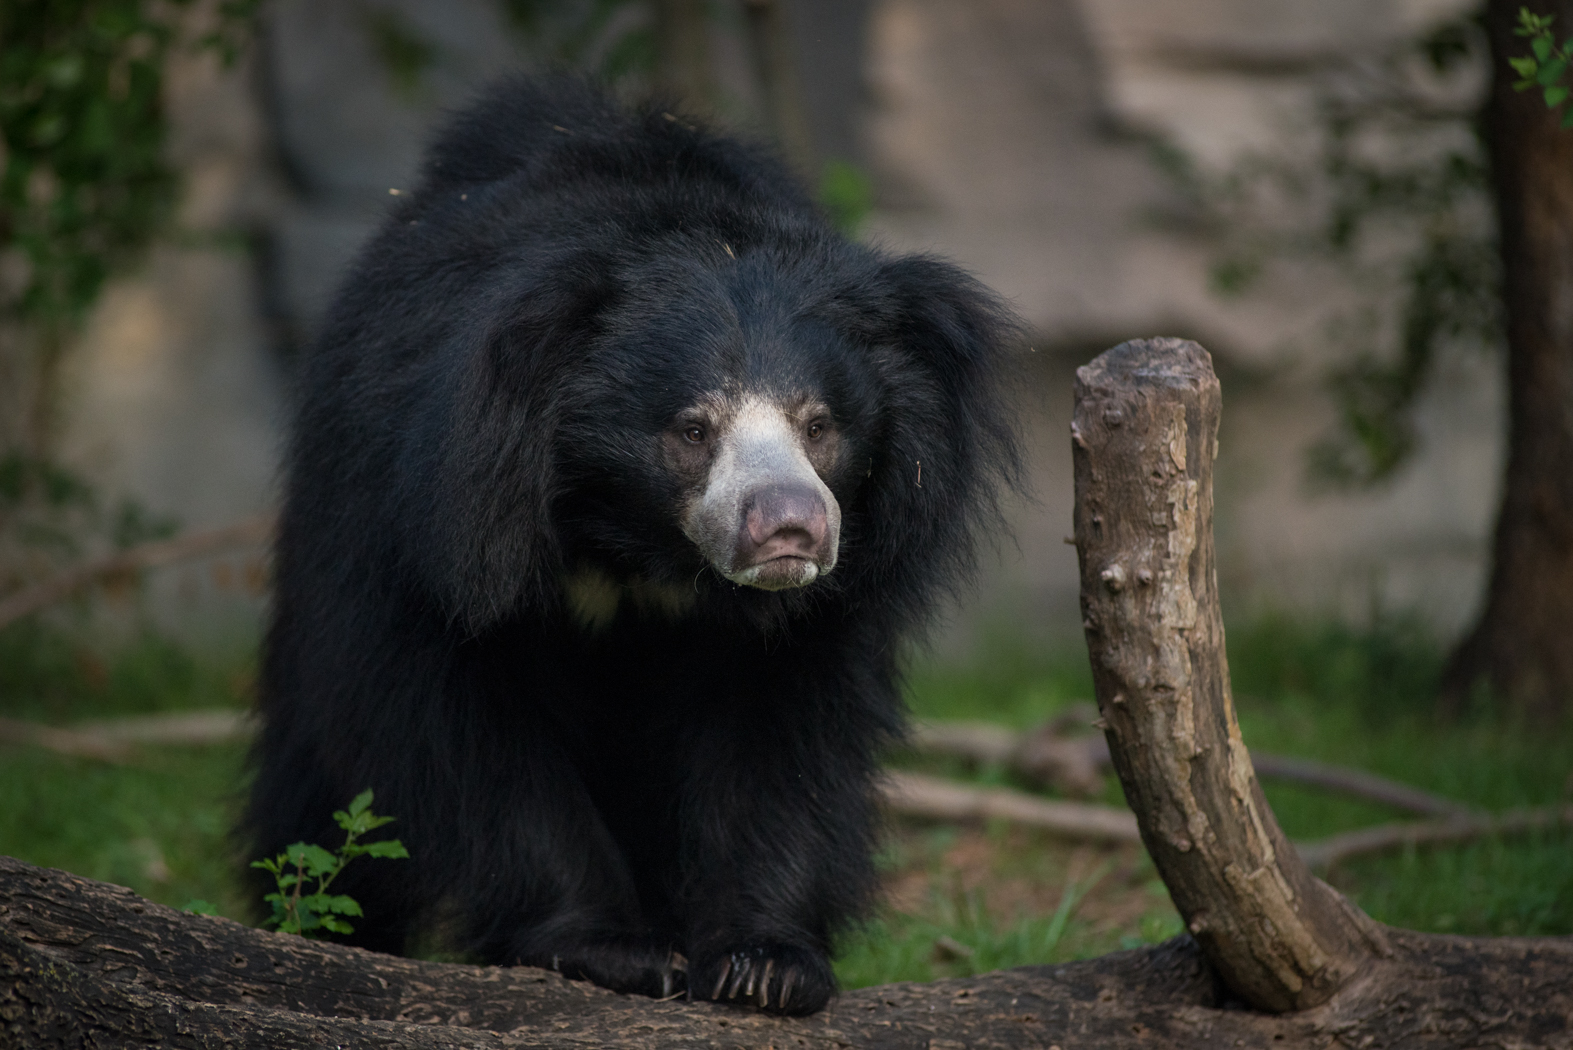 Sloth Bear 1266 - Grahm S. Jones, Columbus Zoo and Aquarium